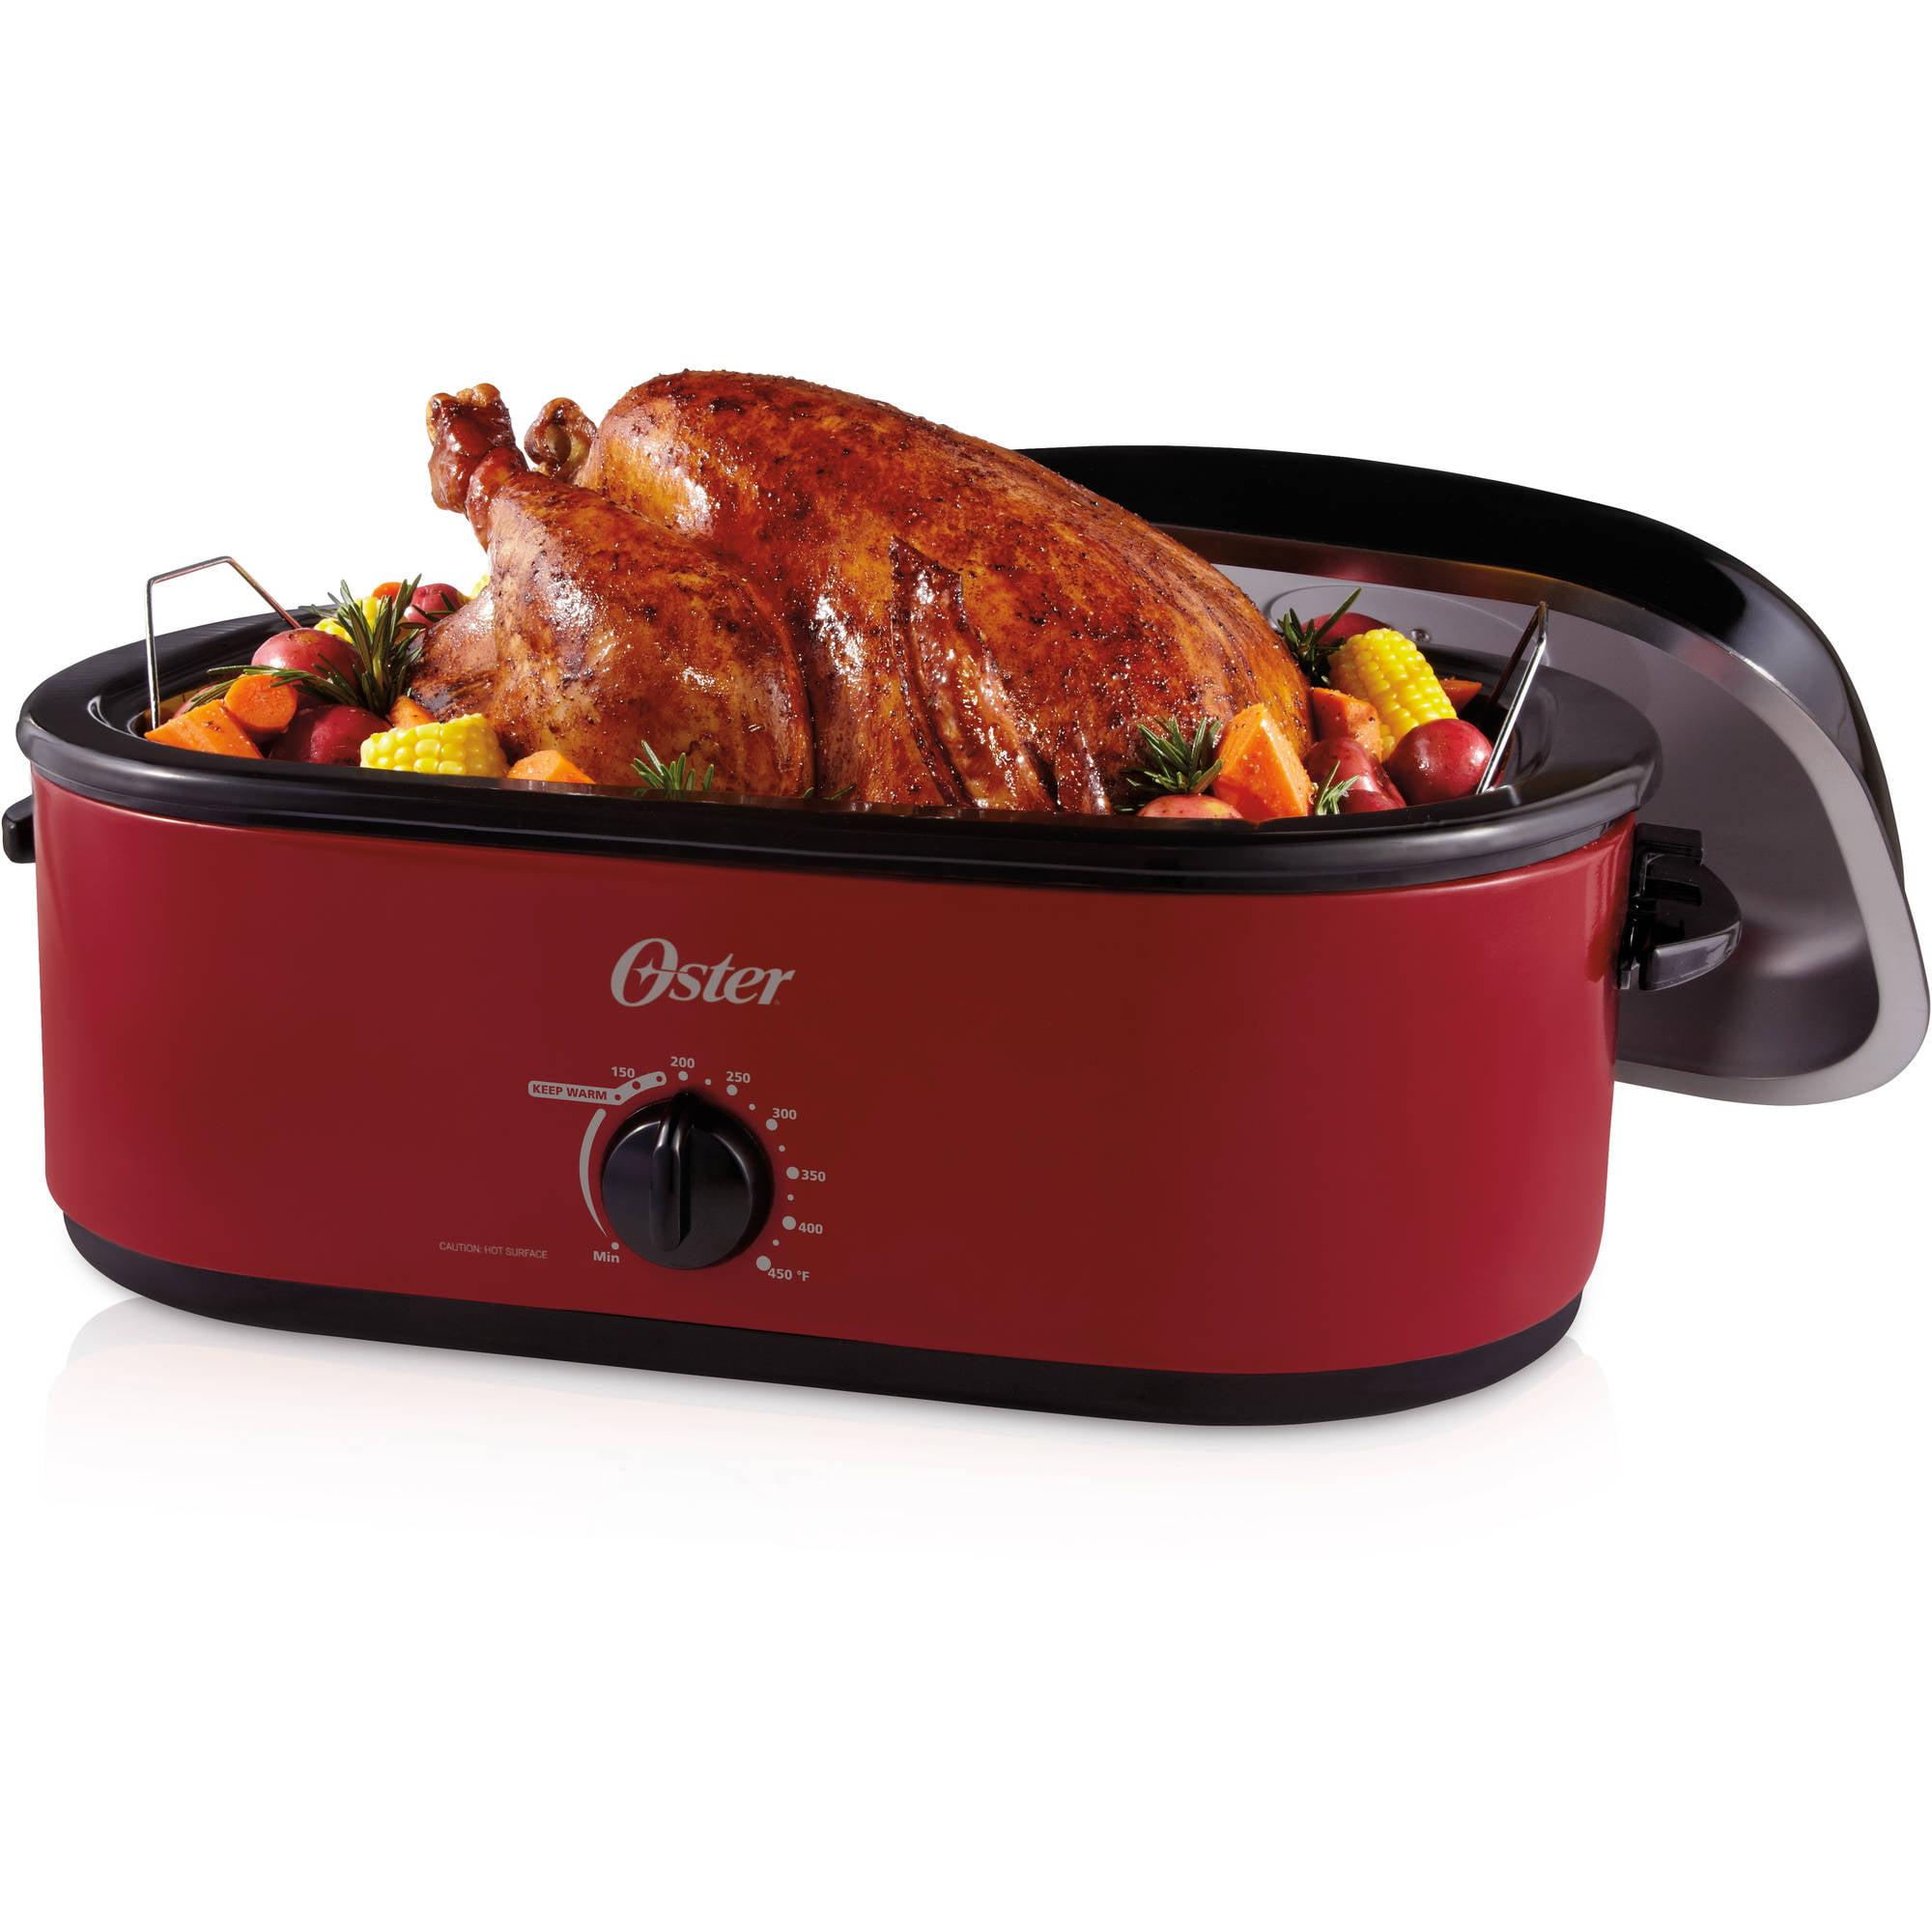 Oster 24-Pound Turkey Roaster Oven, 18-Quart